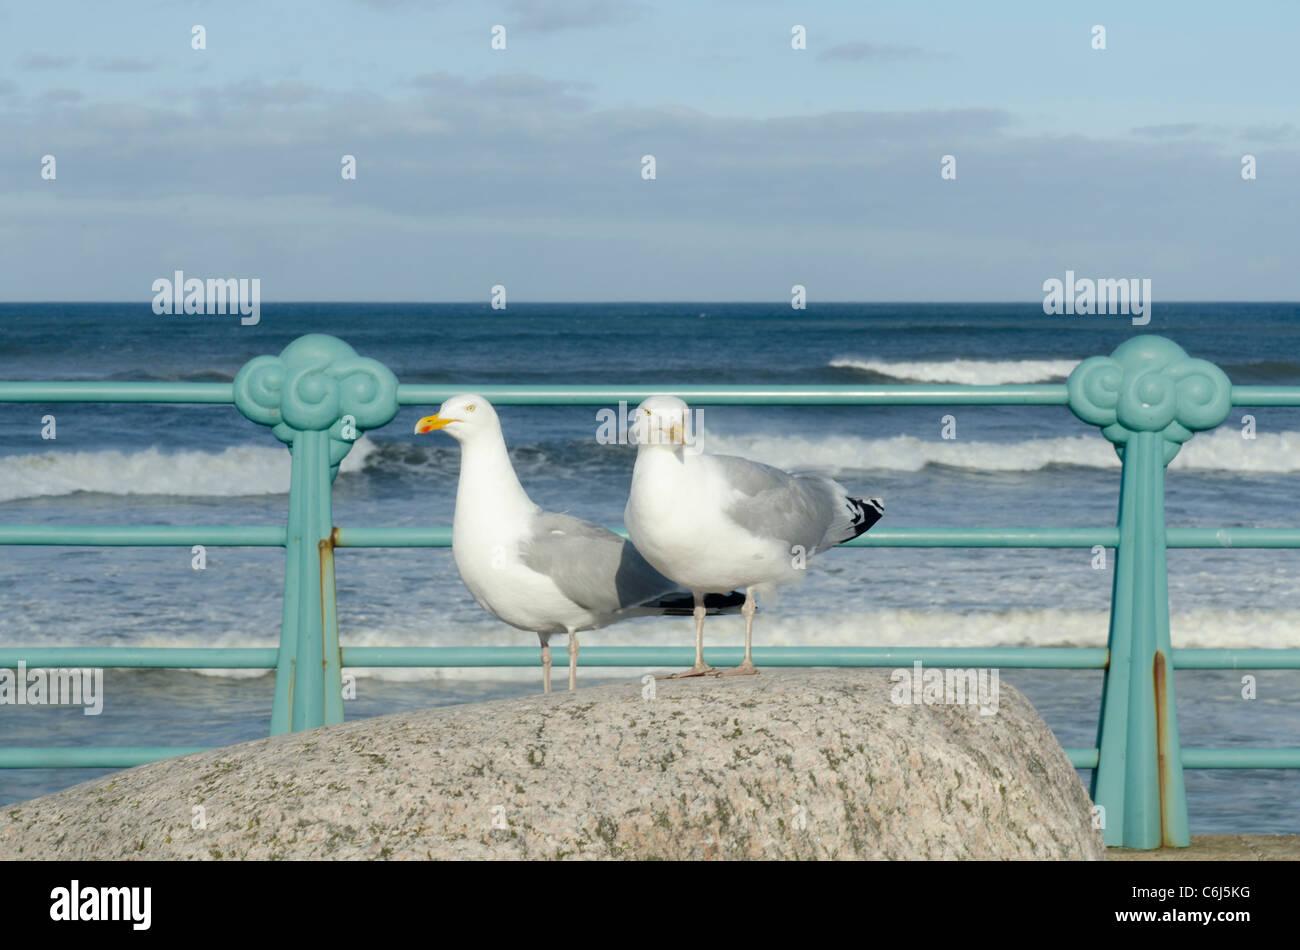 Two seagulls posing at promenade railings - Montrose seafront  Angus - Stock Image